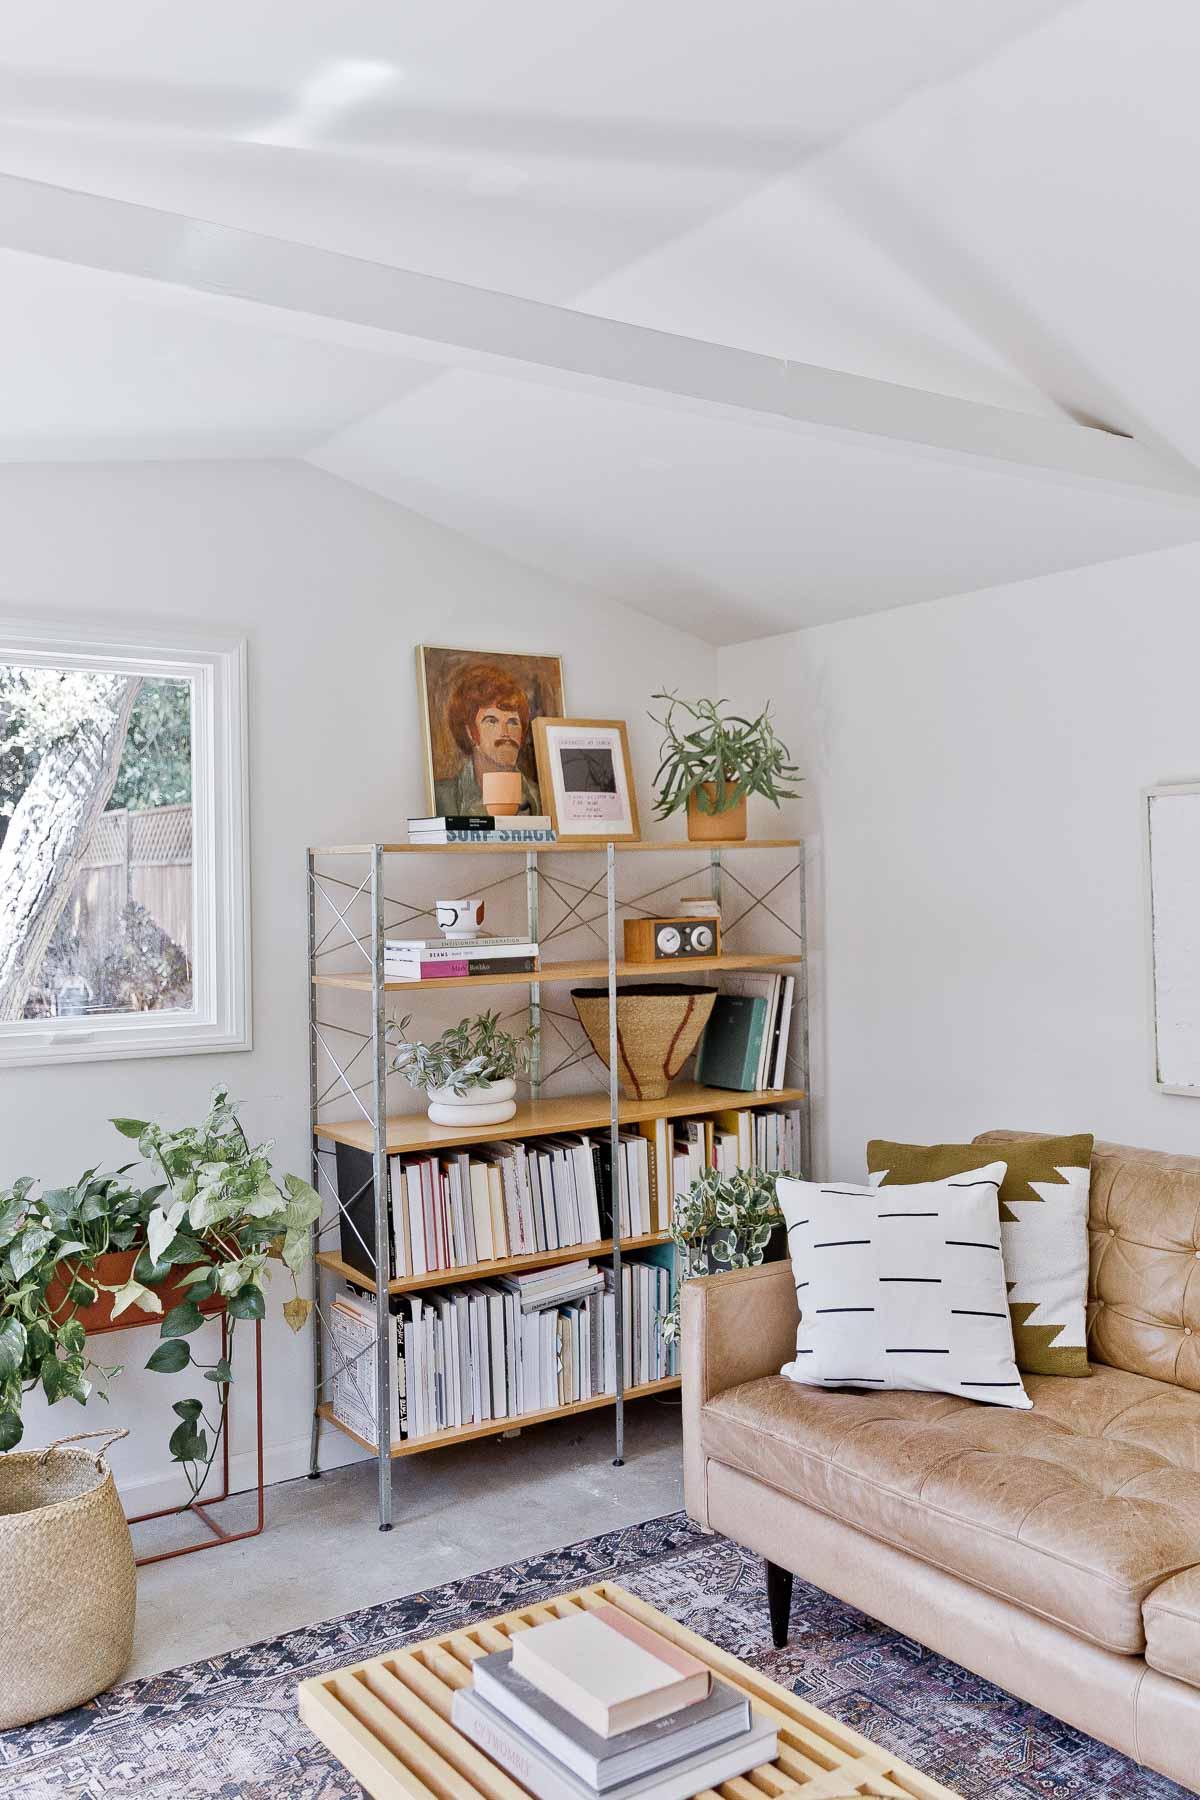 Styled book shelf in organic modern loft space.